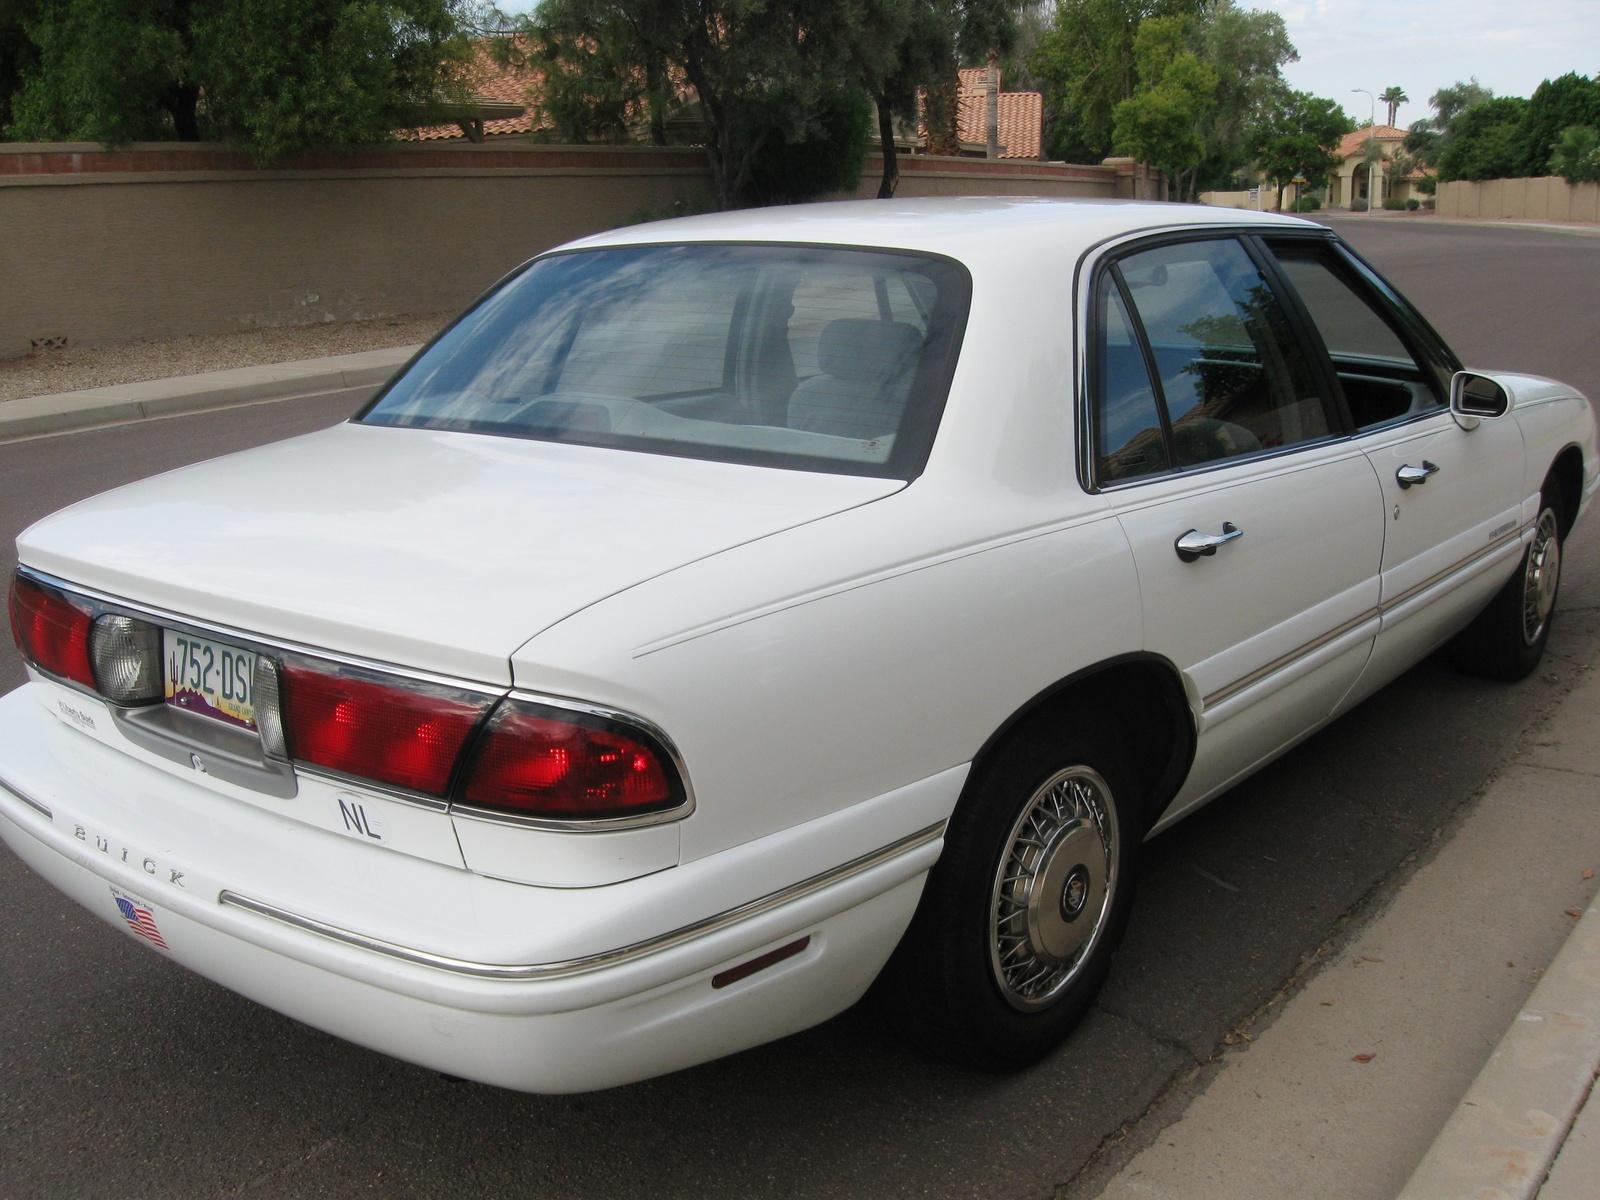 1998 Buick Lesabre - Pictures